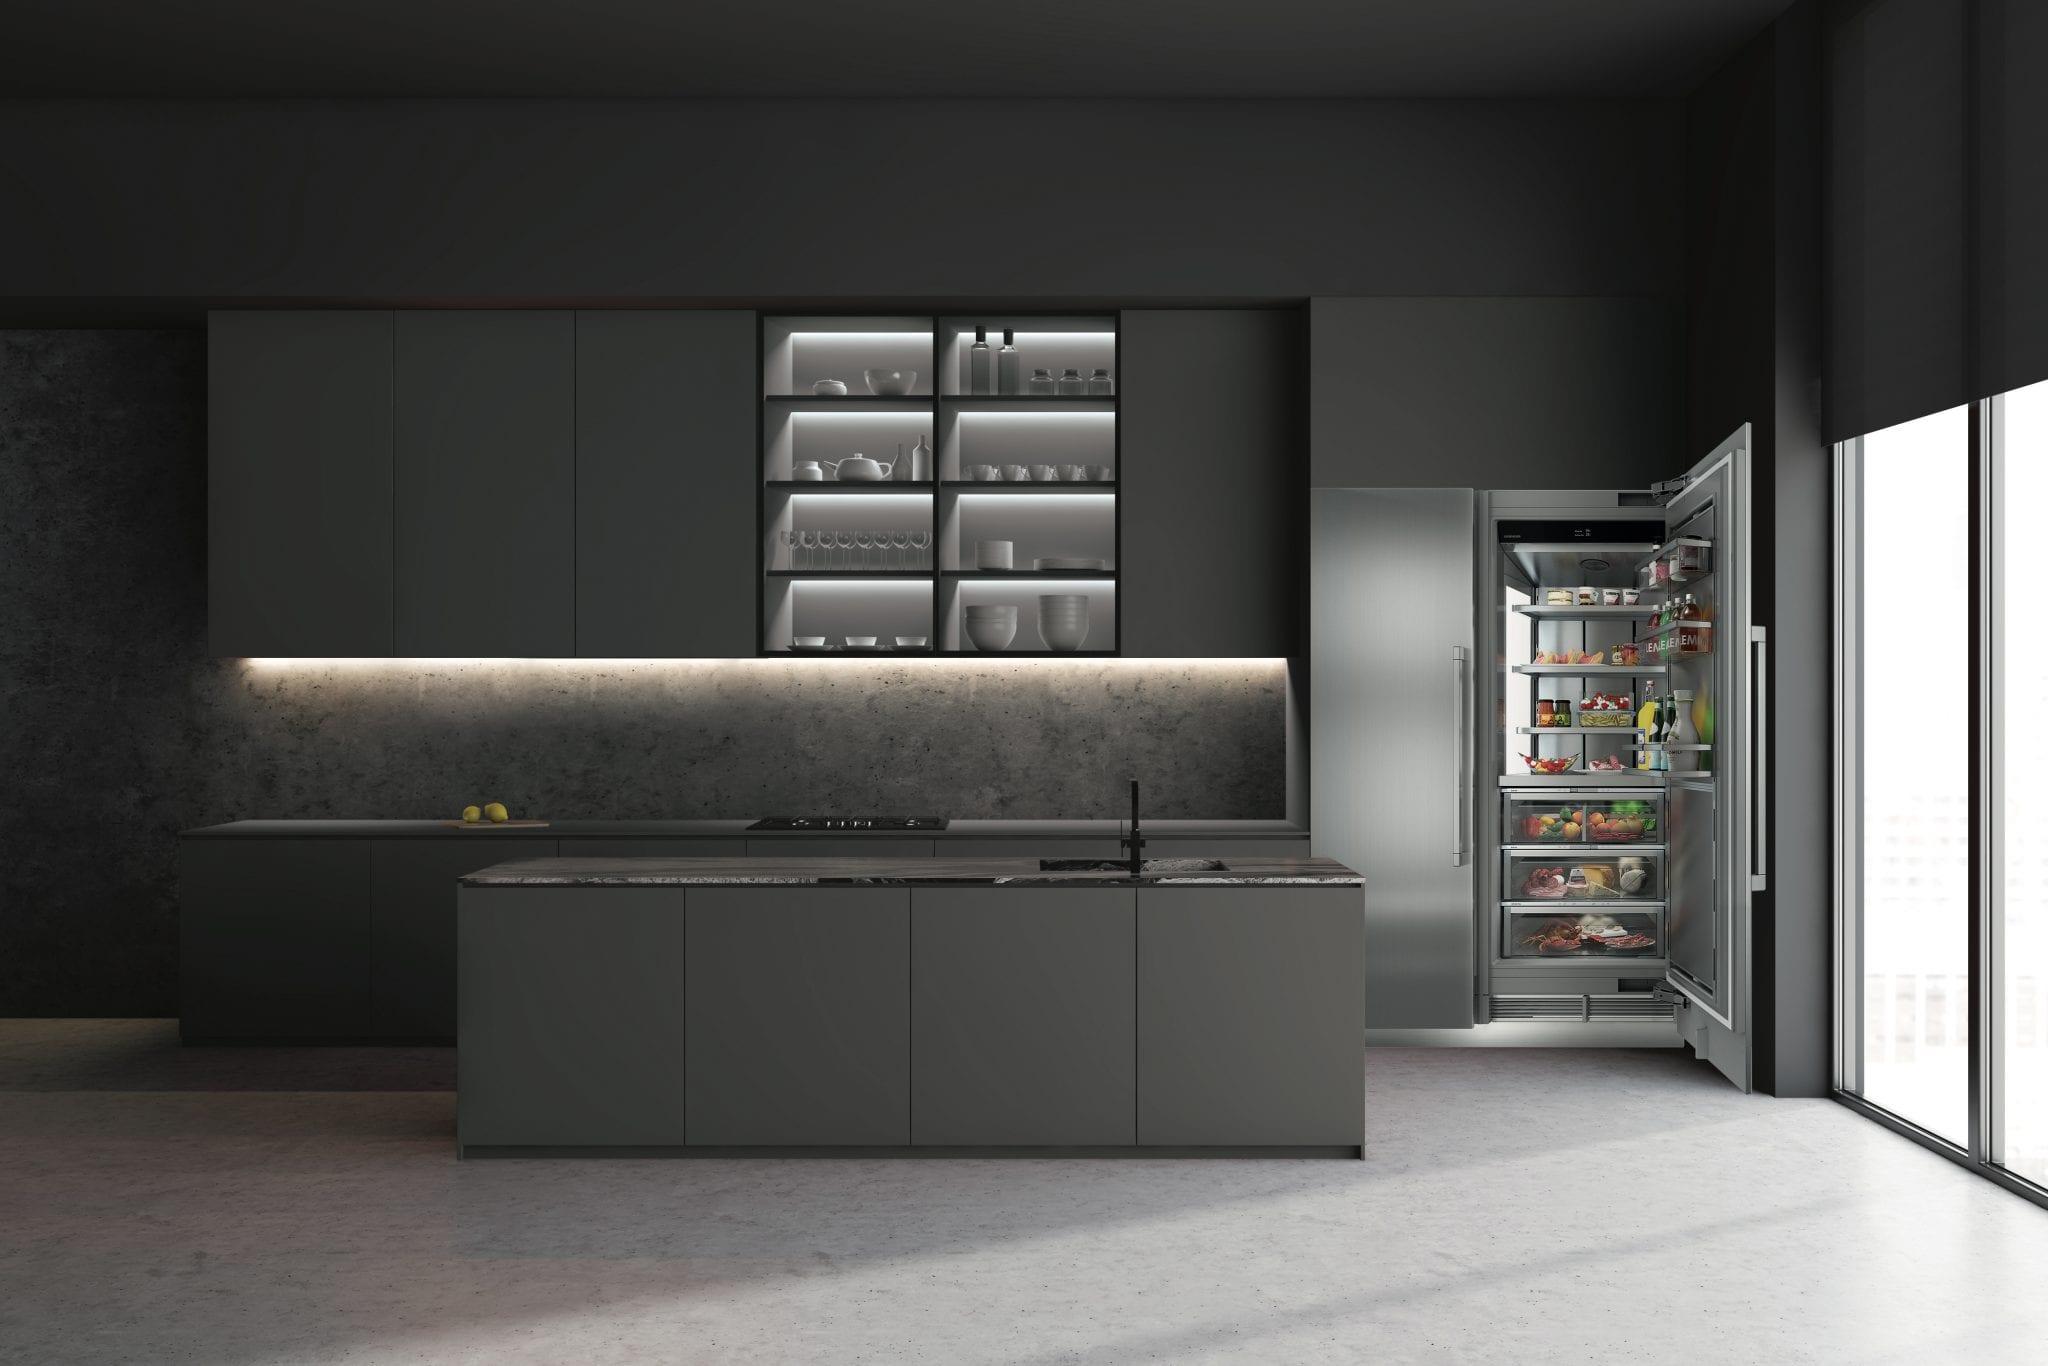 The refrigerator: Your home's biggest energy hog